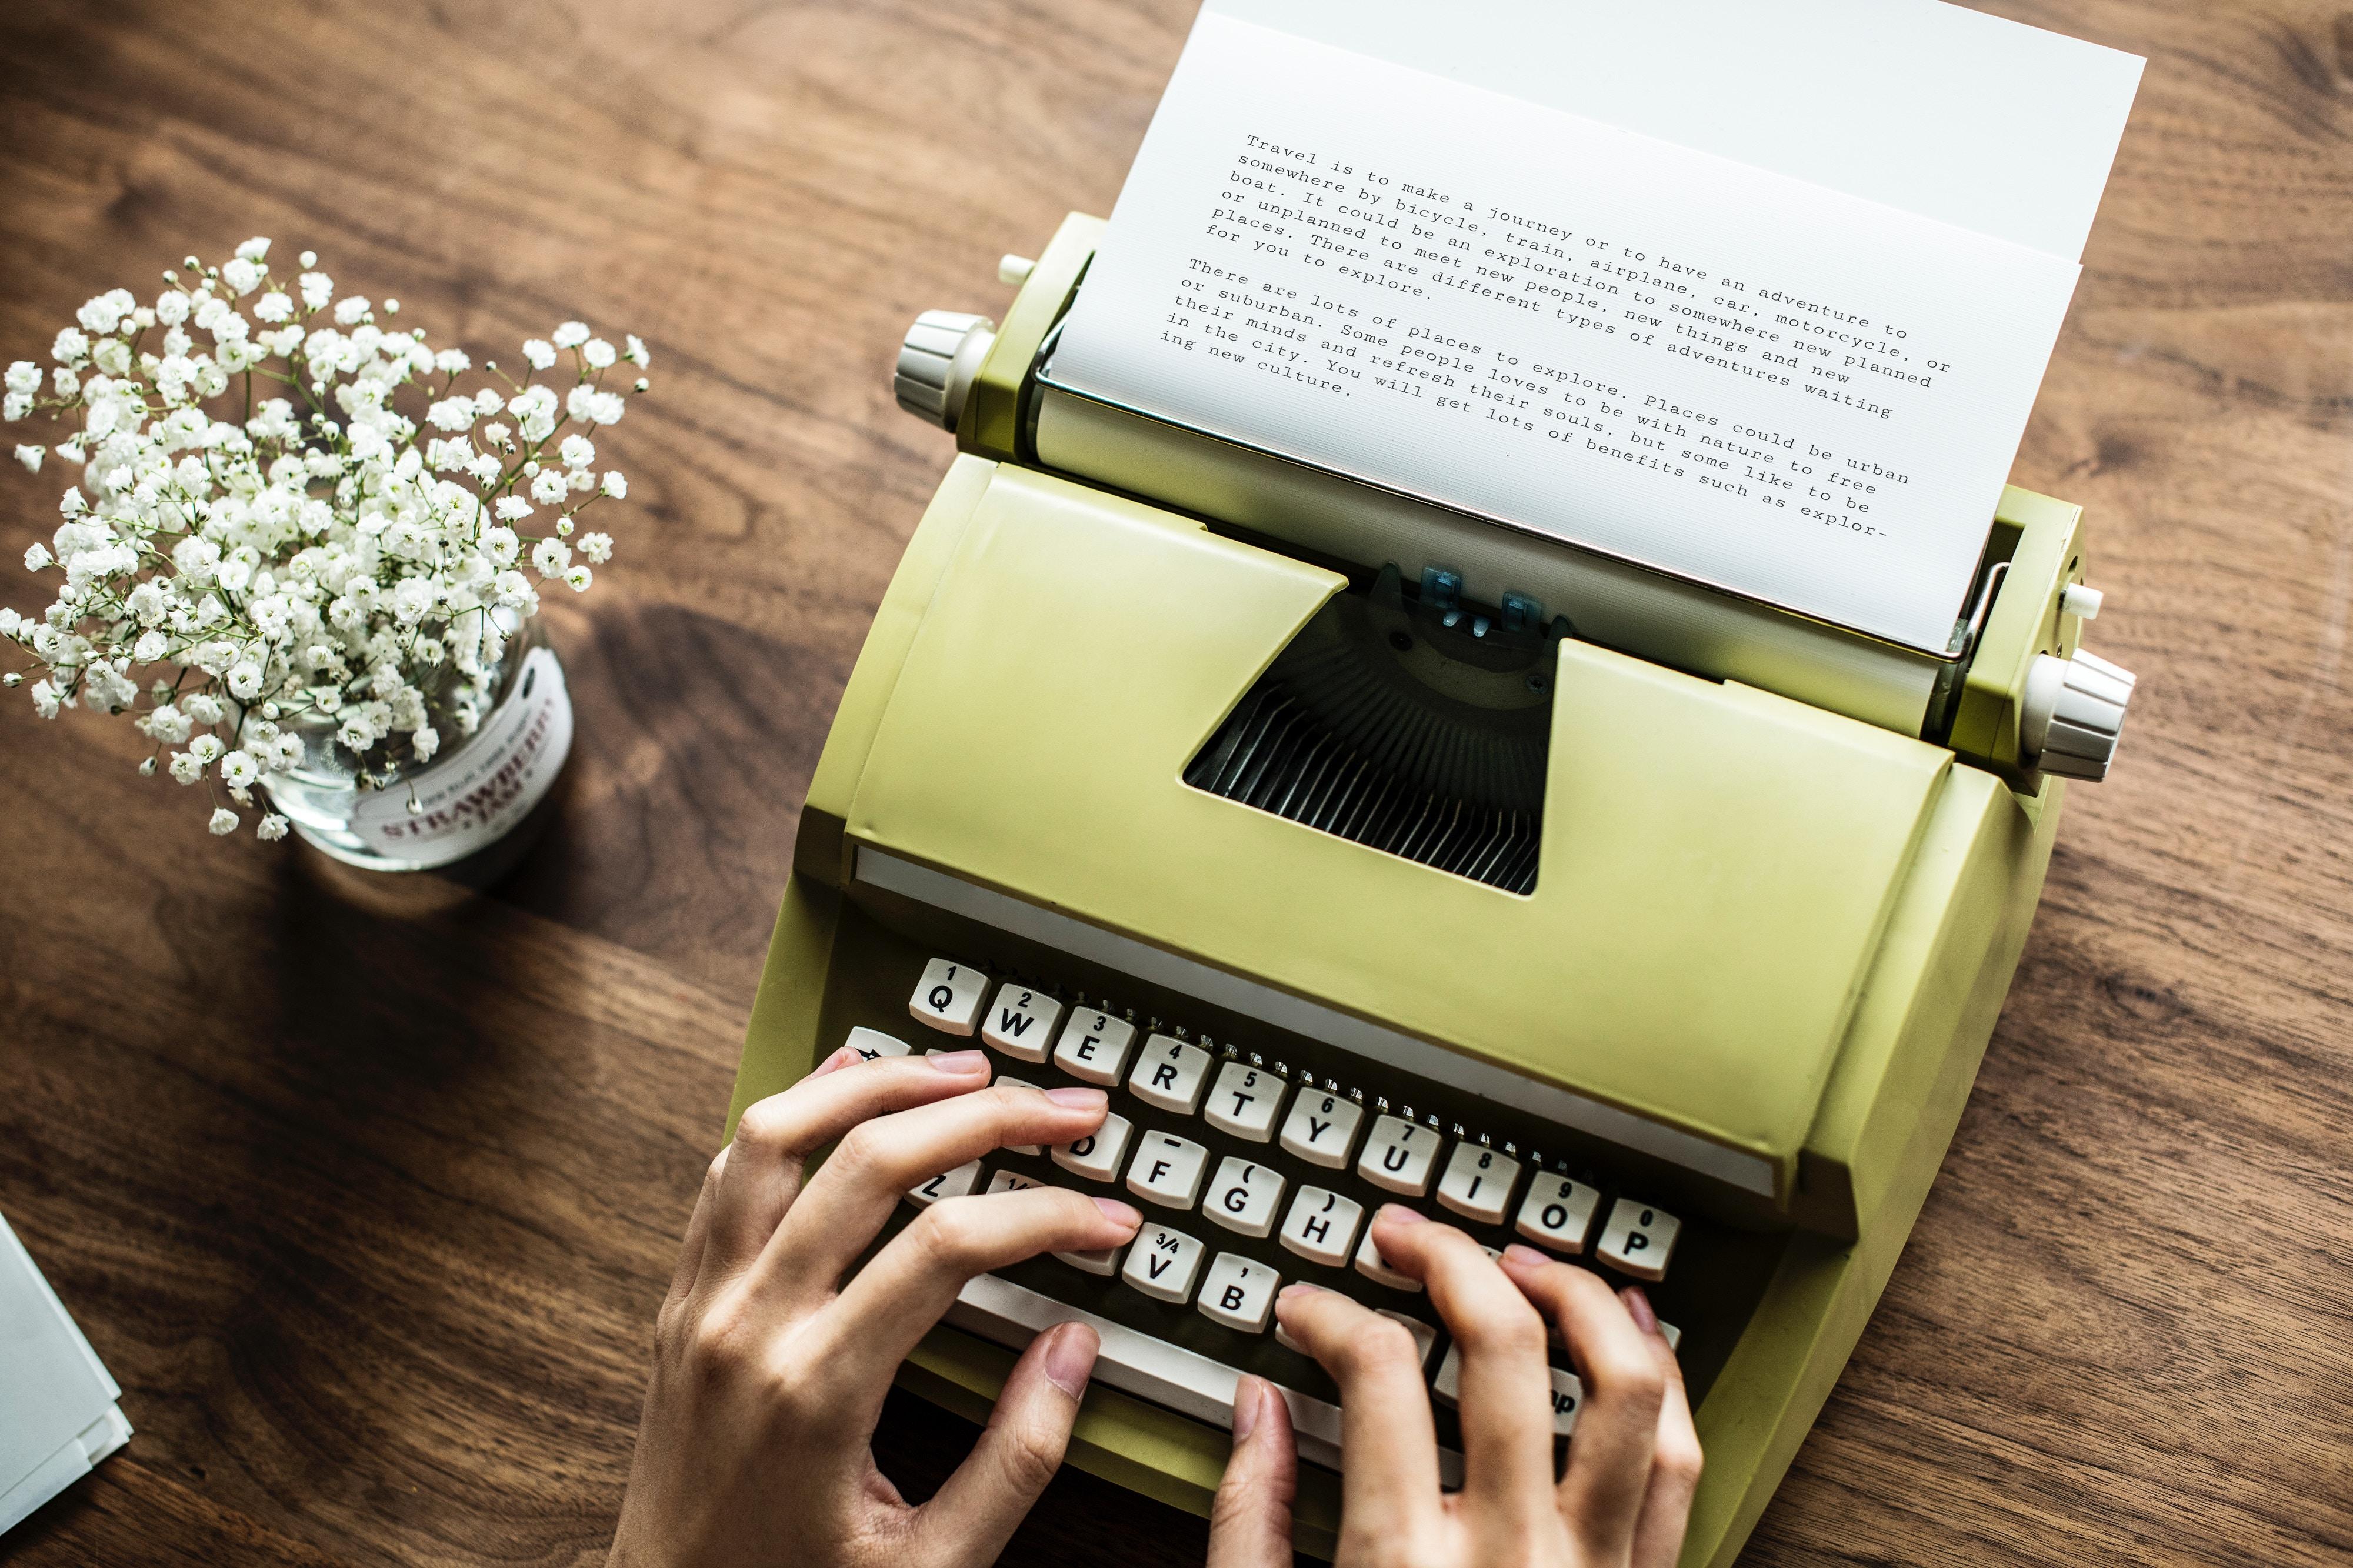 literary essay rebecca renner personal essay american essayist woman essayist woman writer